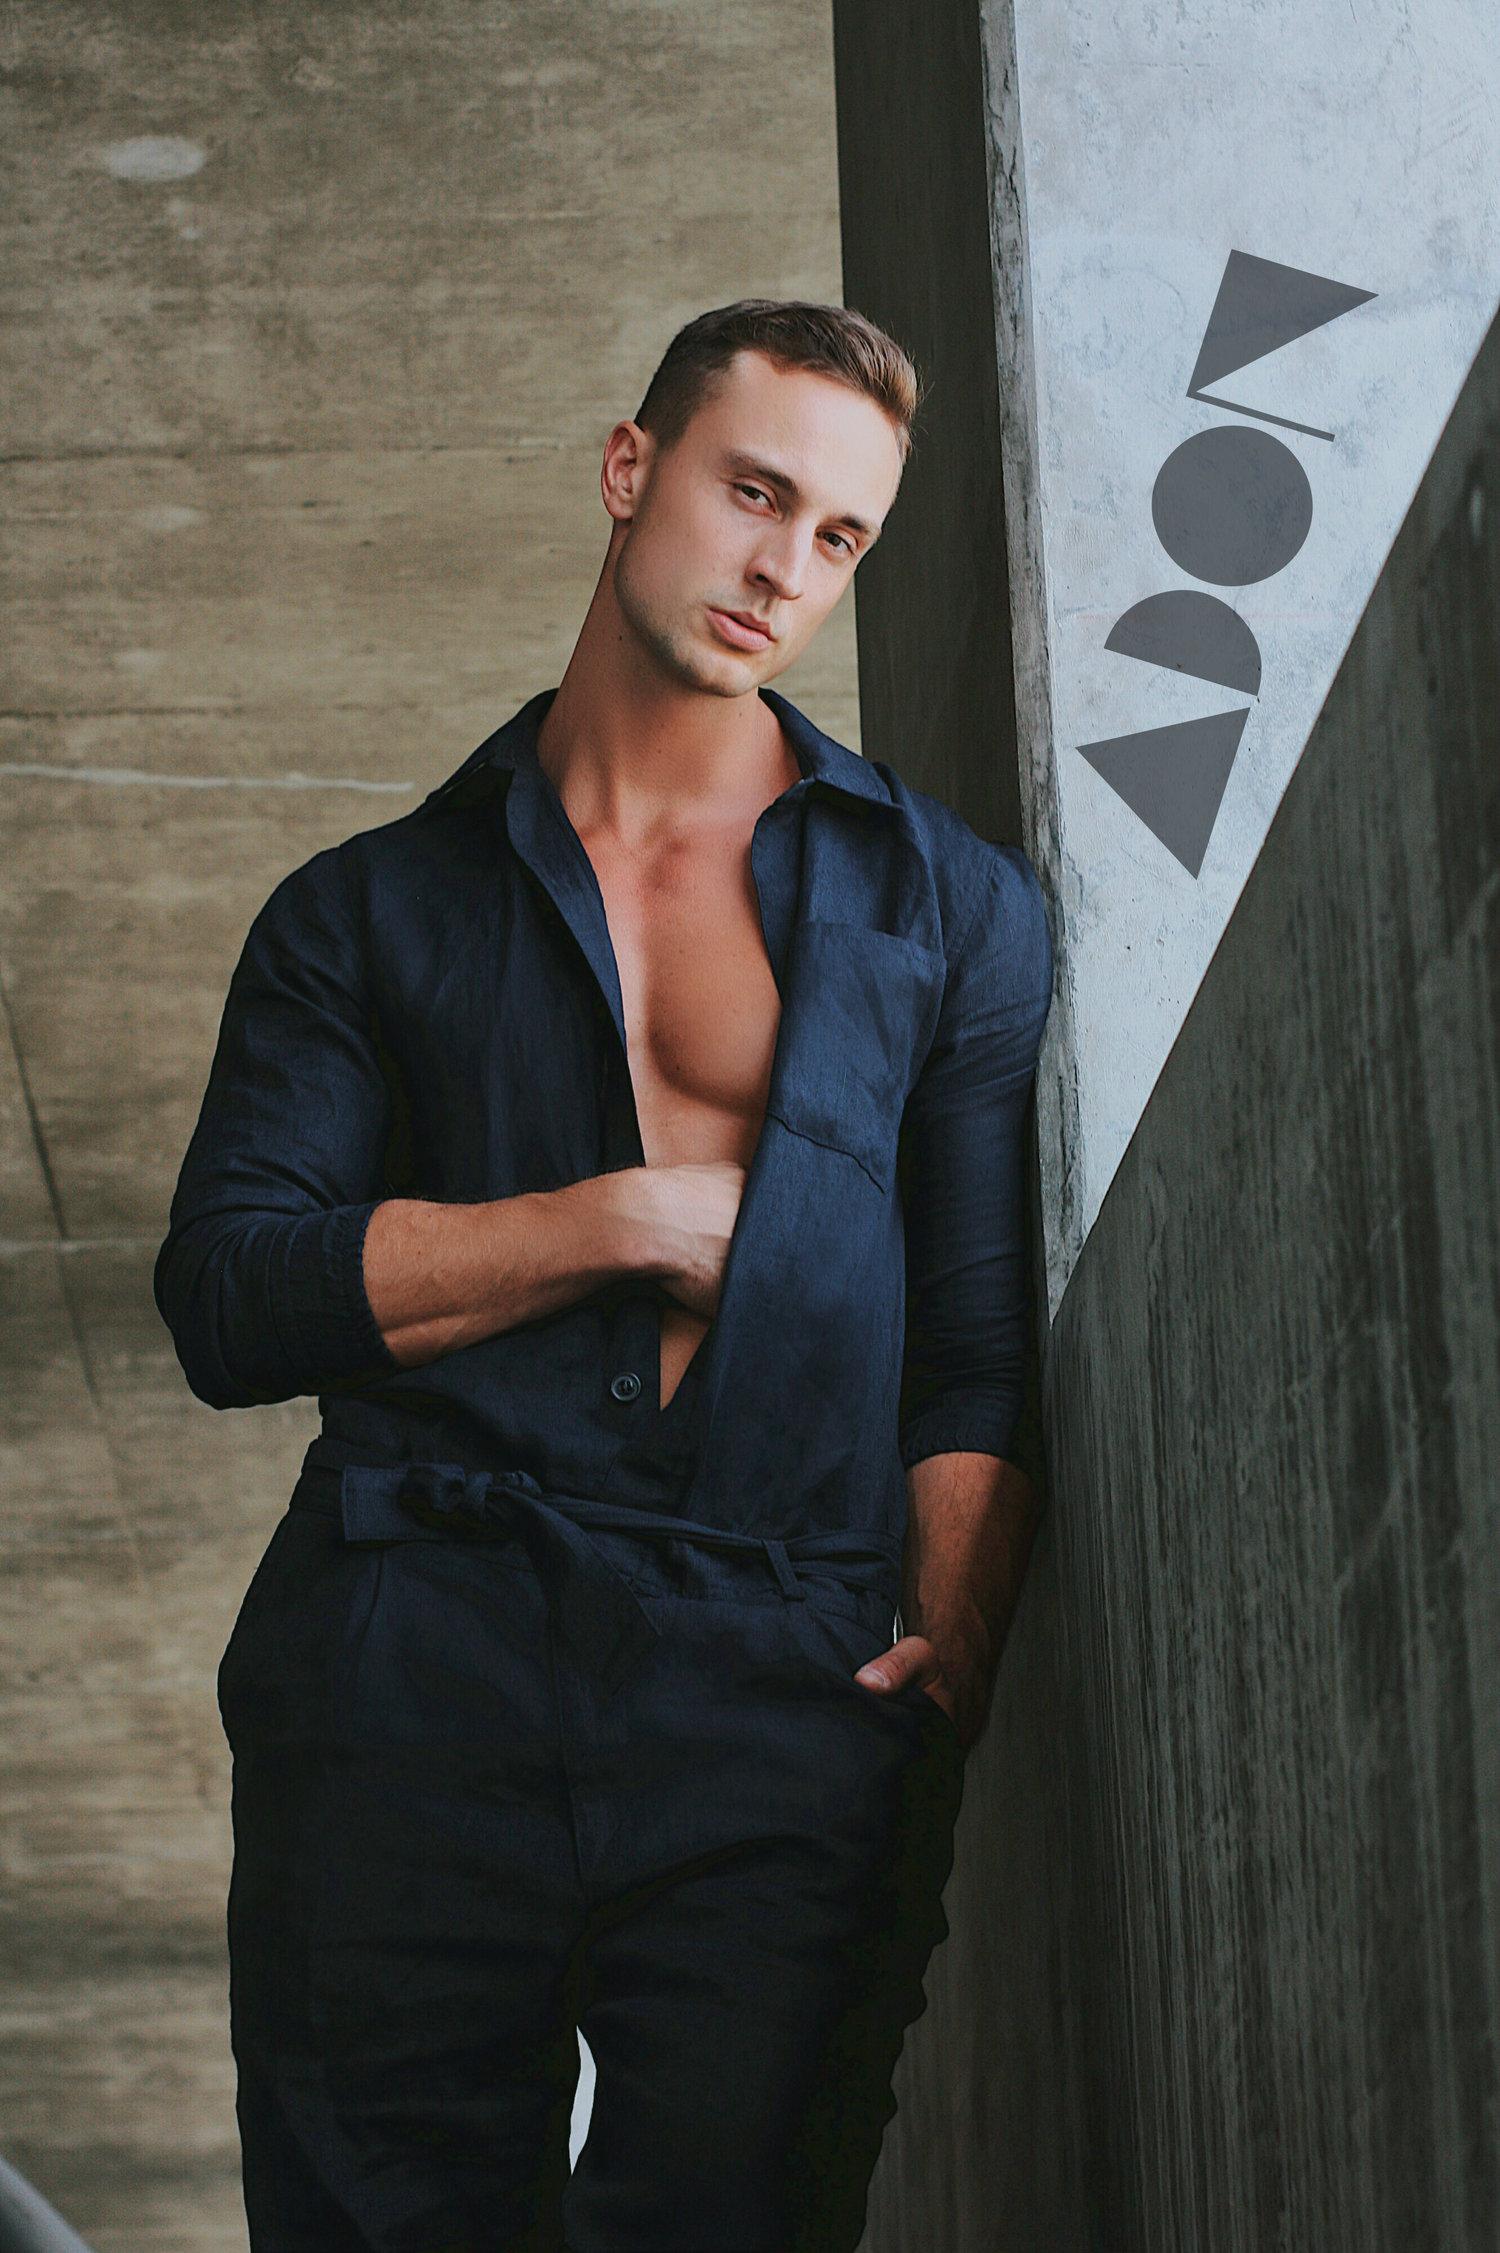 Adon Exclusive: Model Derek Tolnai By Luis Lucas